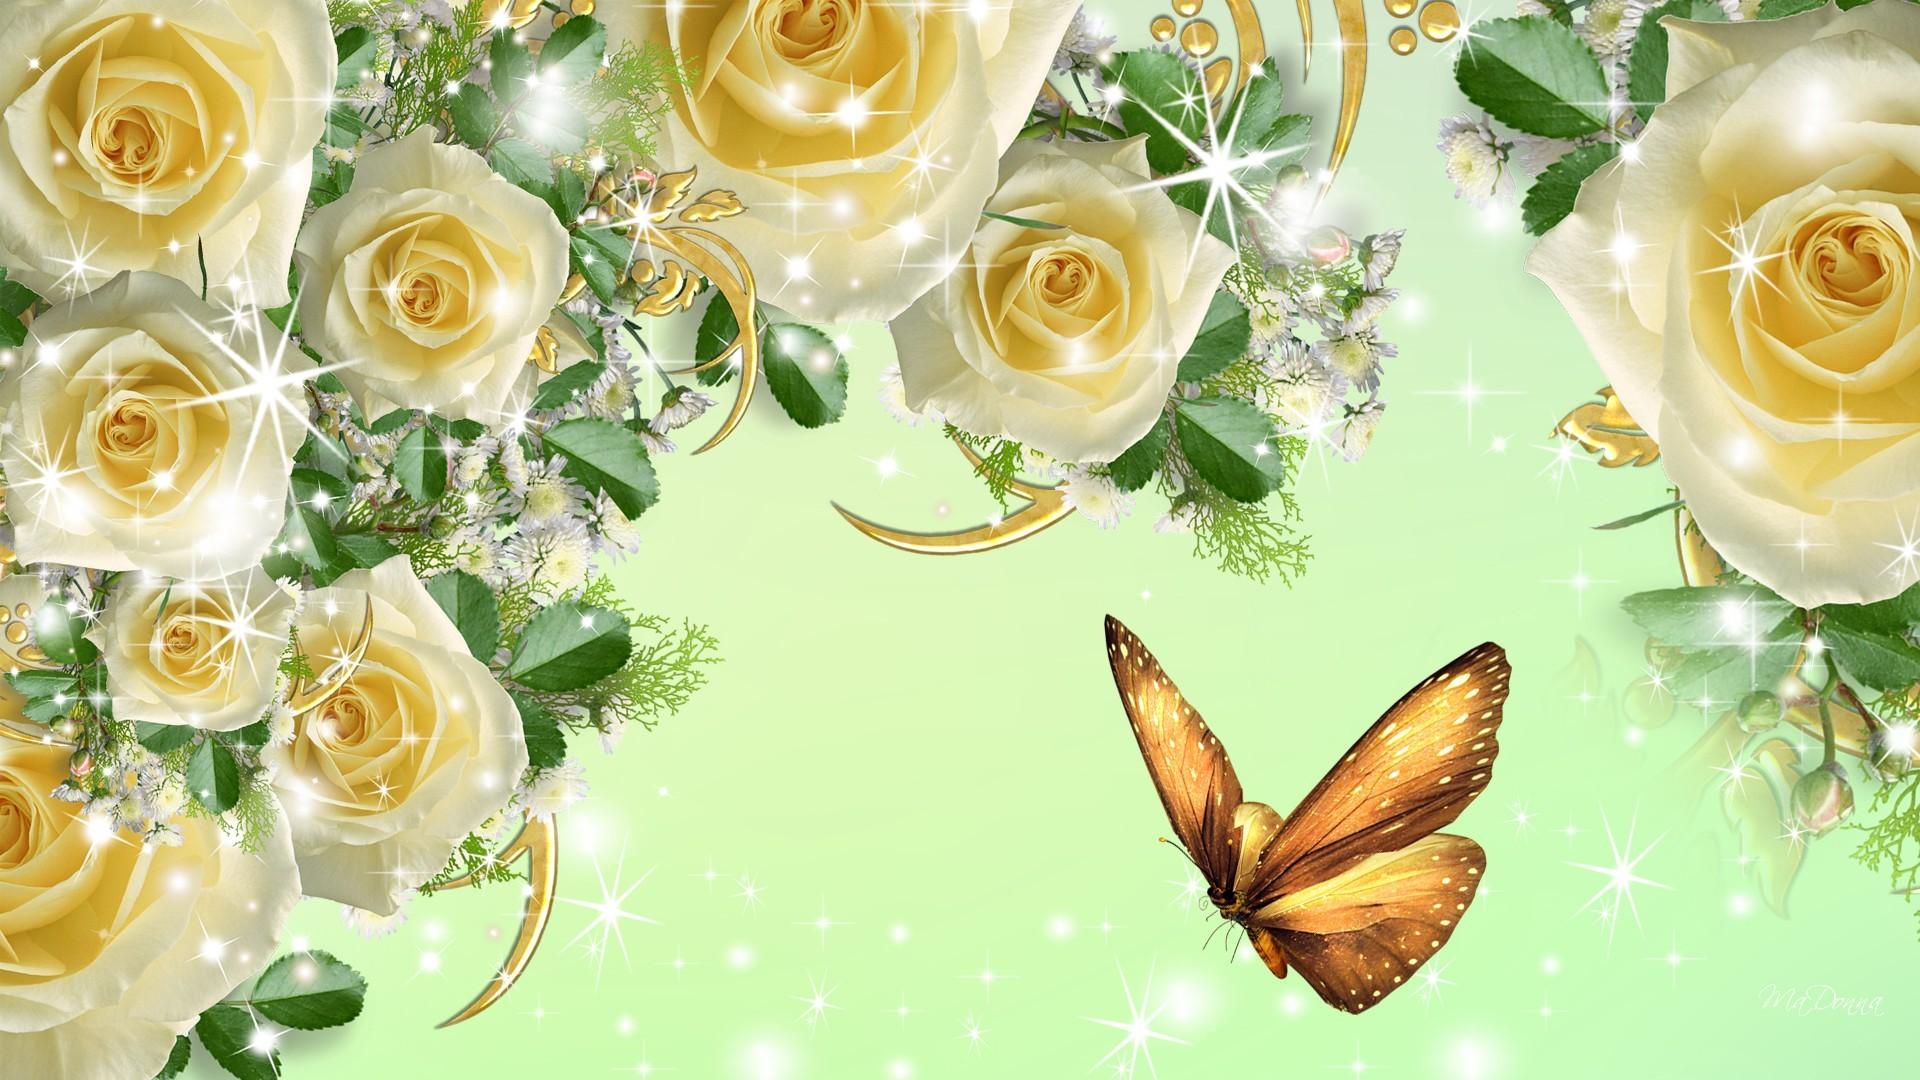 Yellow Rose Background 183 '�